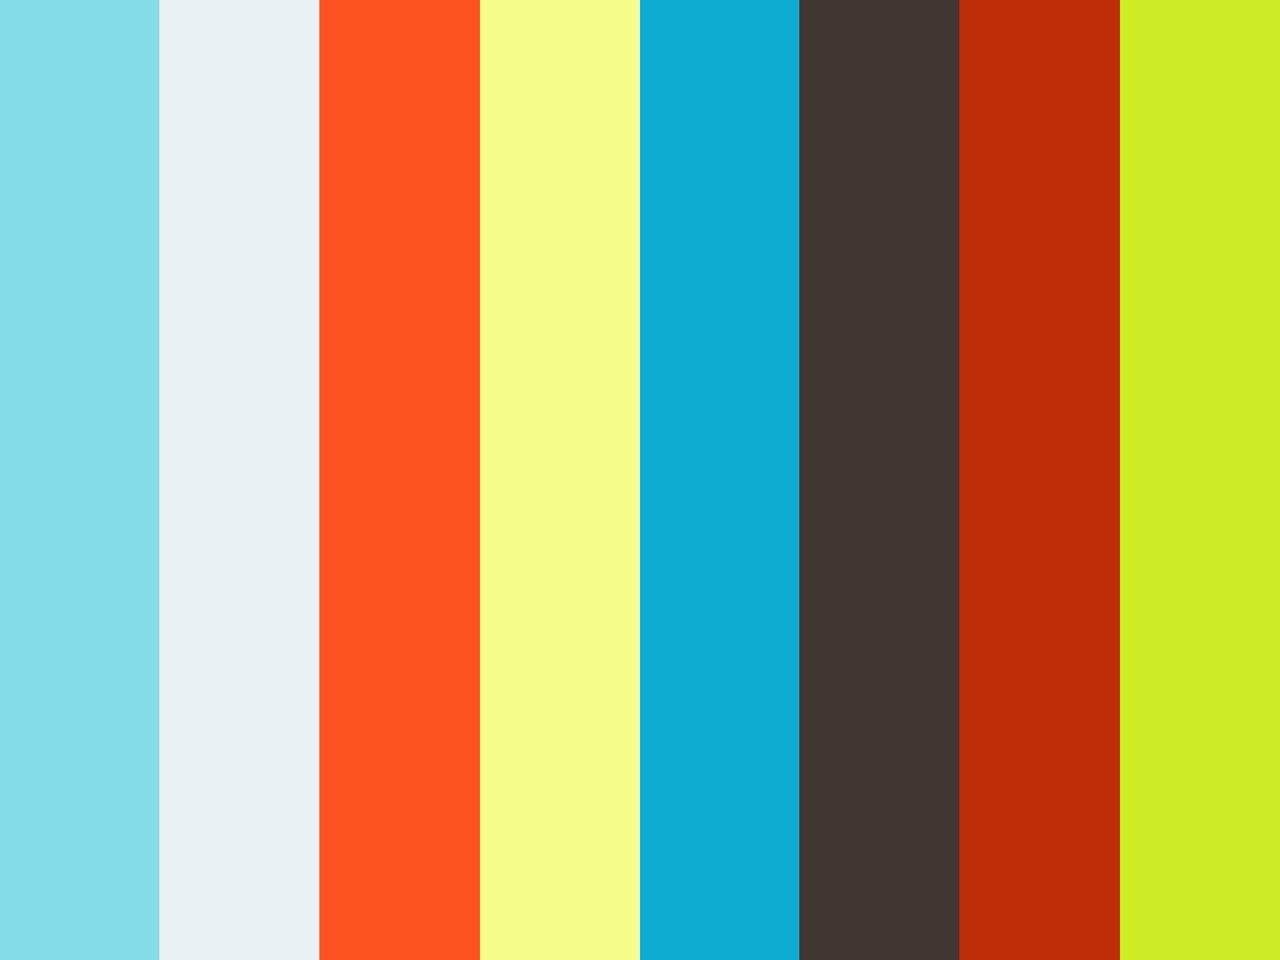 2.76:1 Ultra panavision70's ratio  - Mavo LF Anamorphic